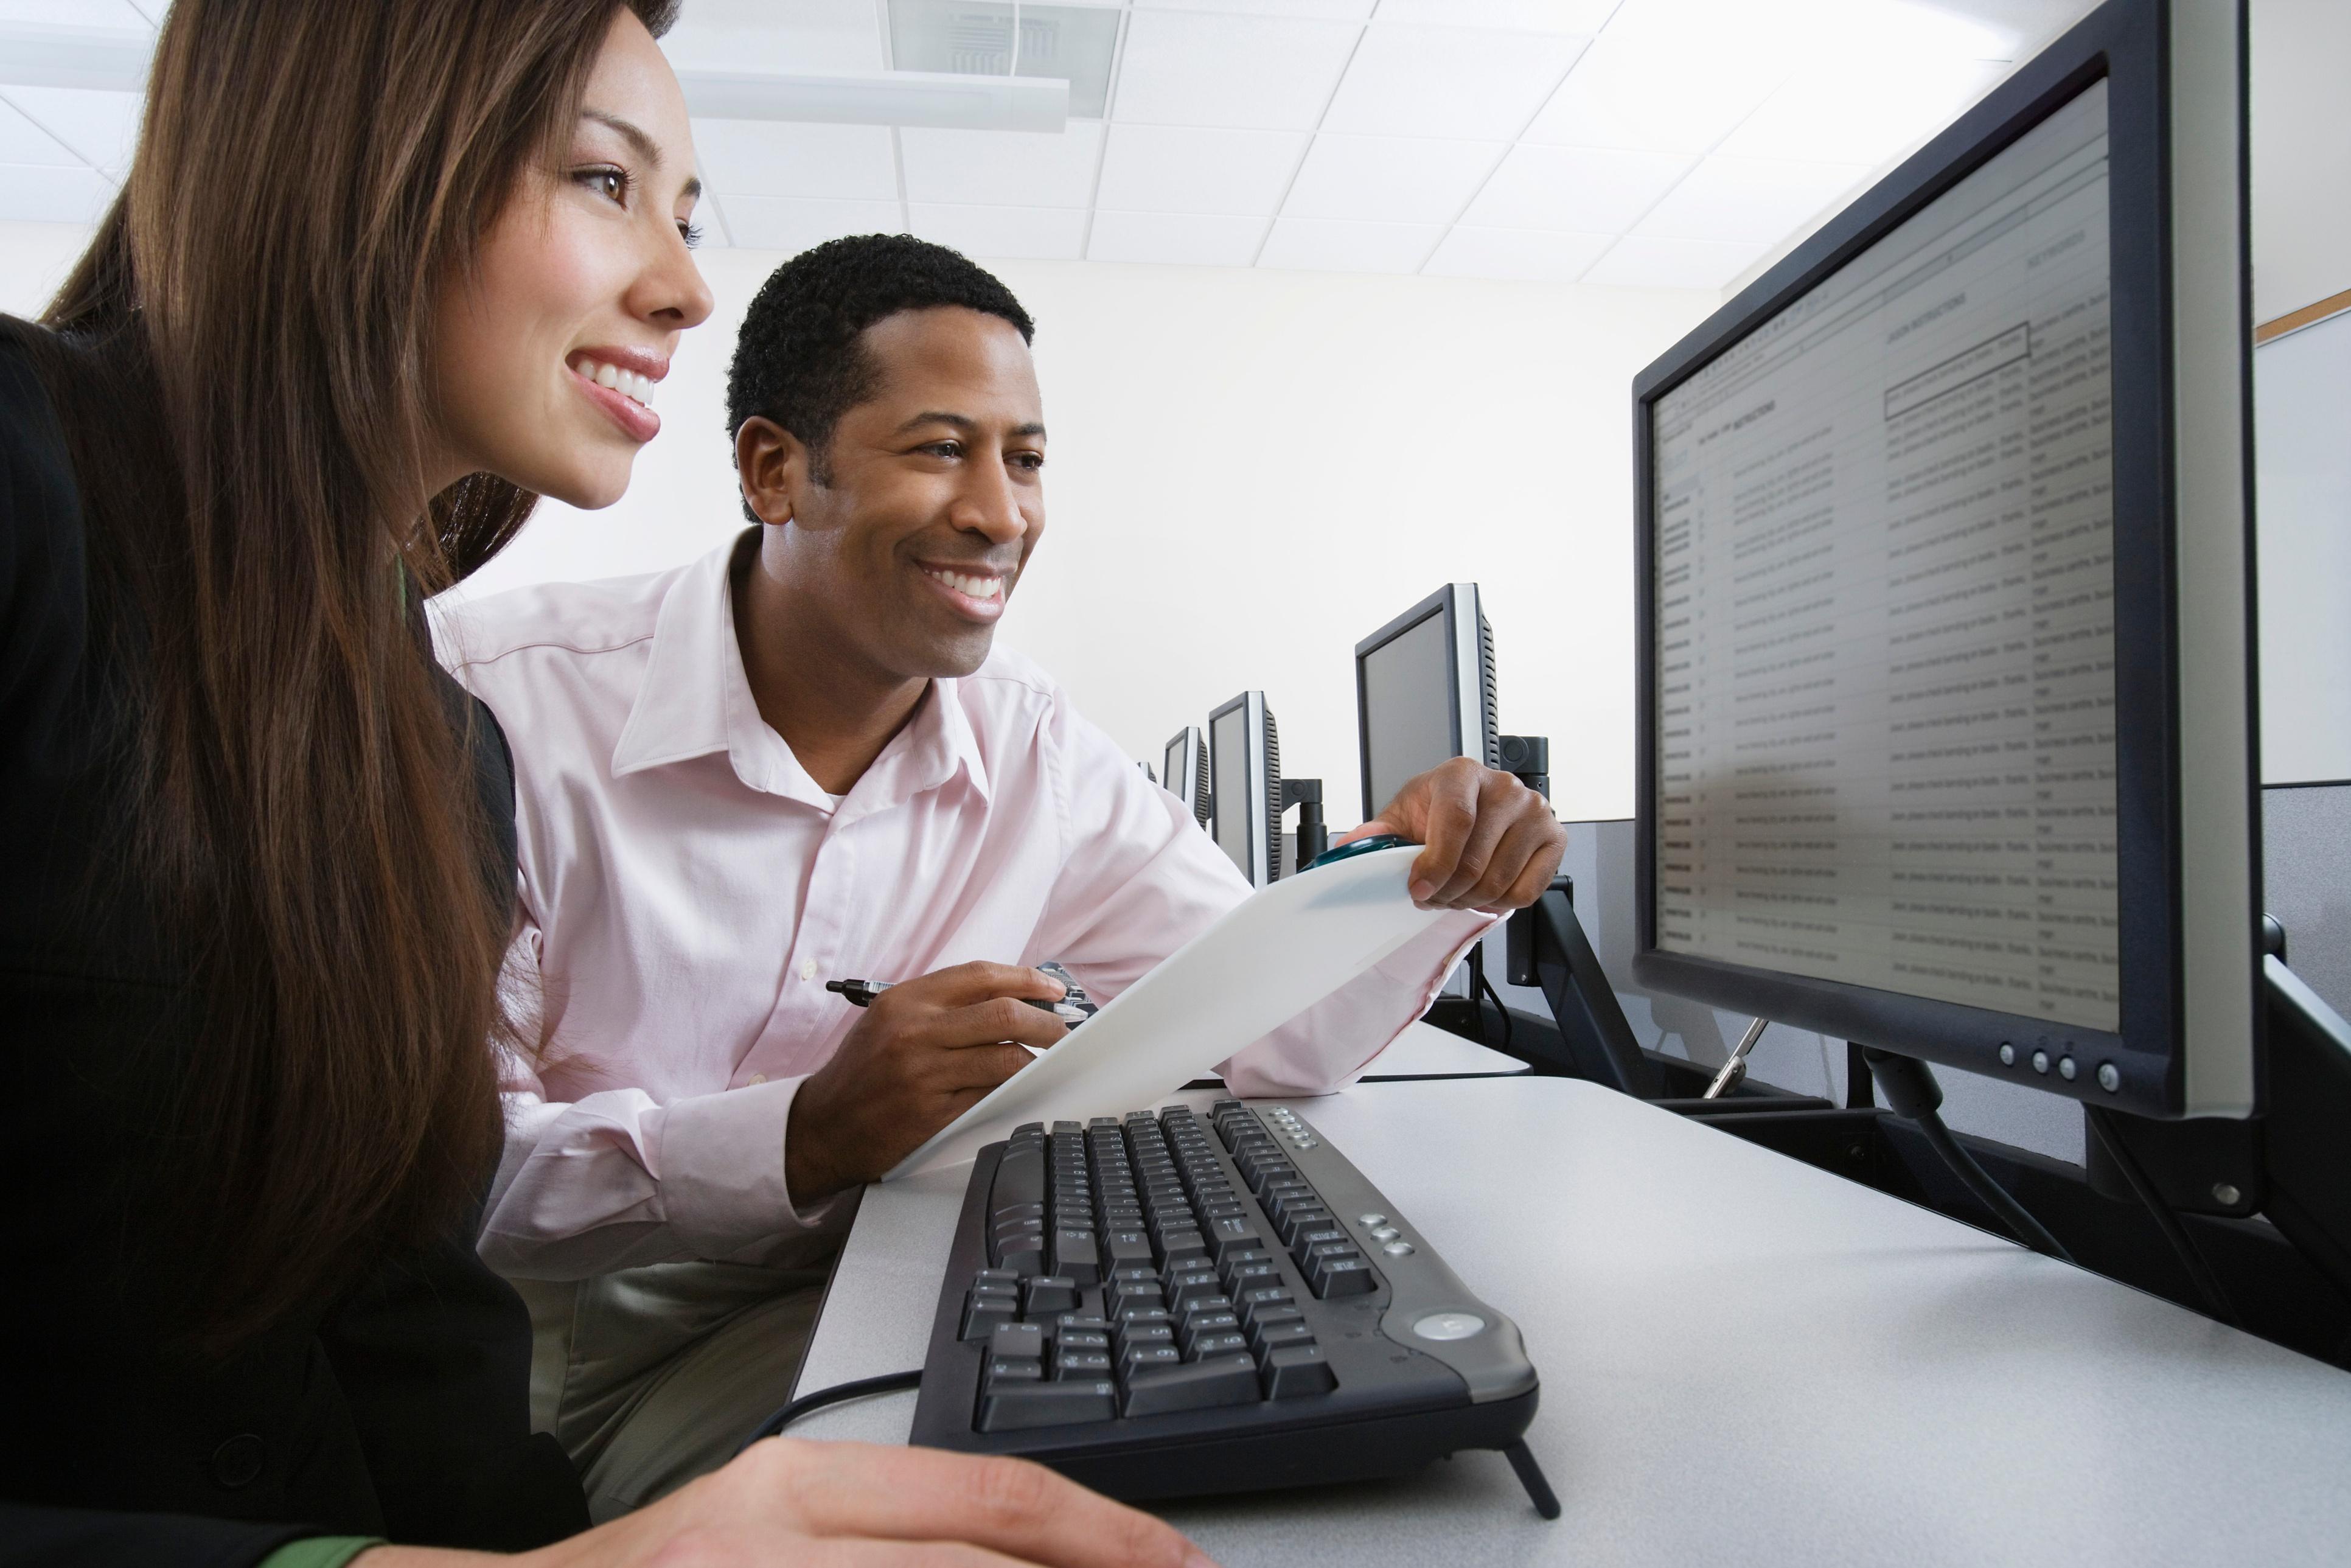 11 most popular jjc majors joliet junior college computer network security specialist